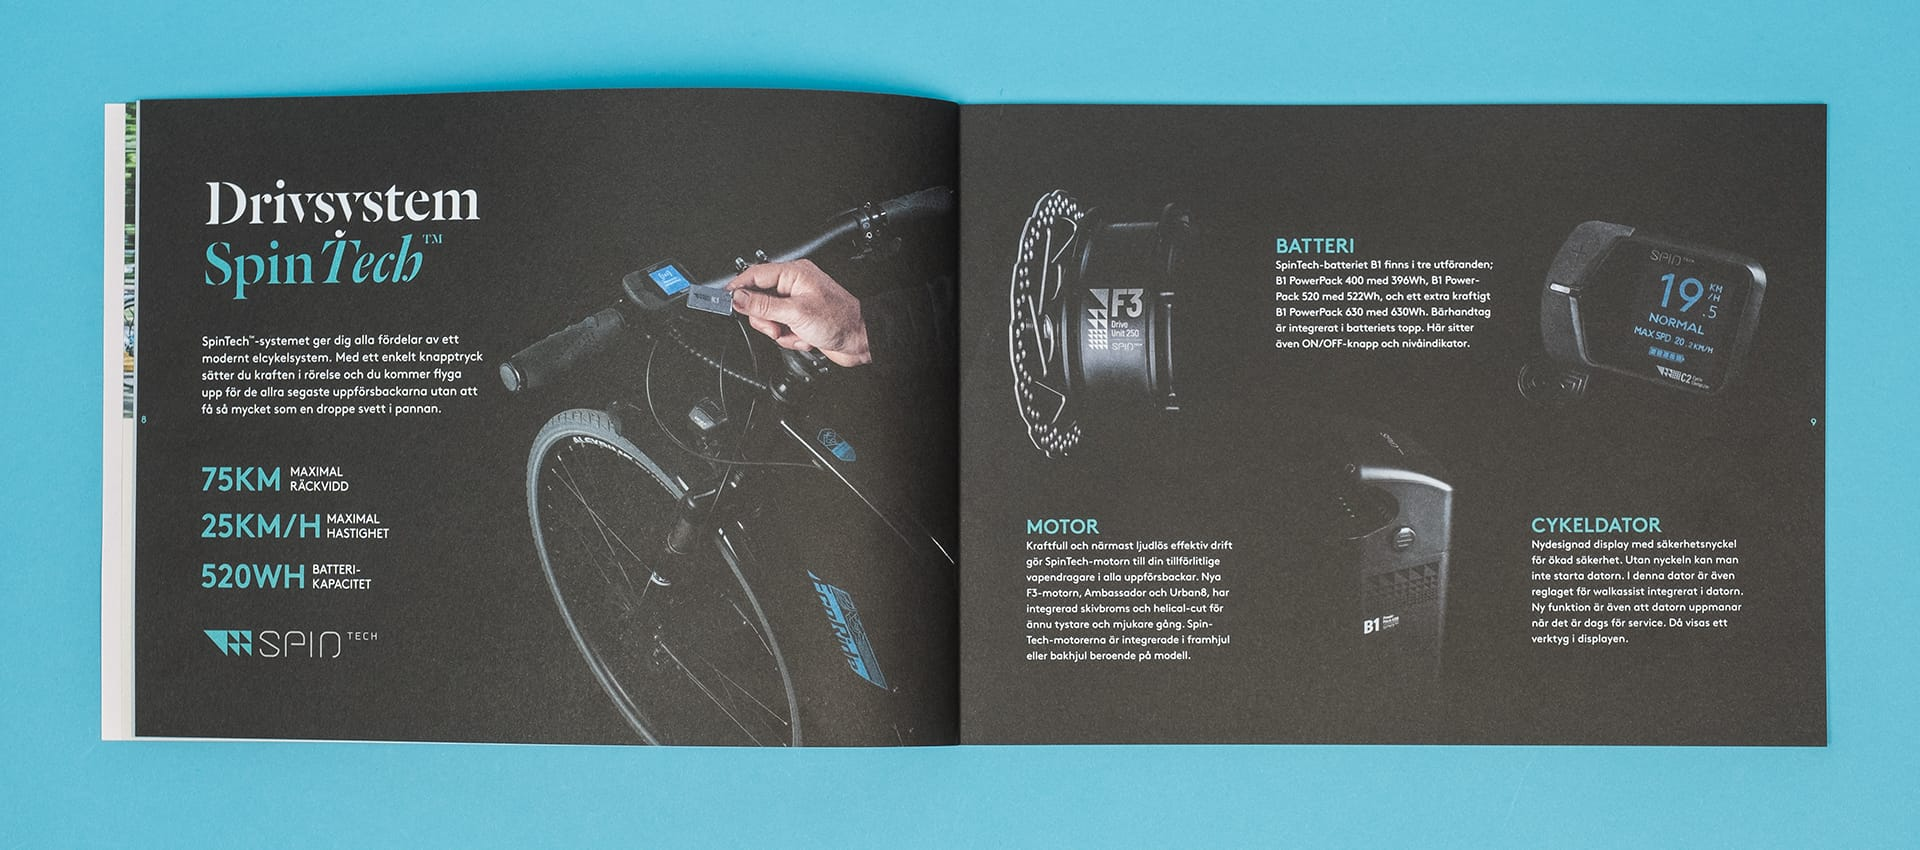 Ecoride-Print-Design-mnecander-4